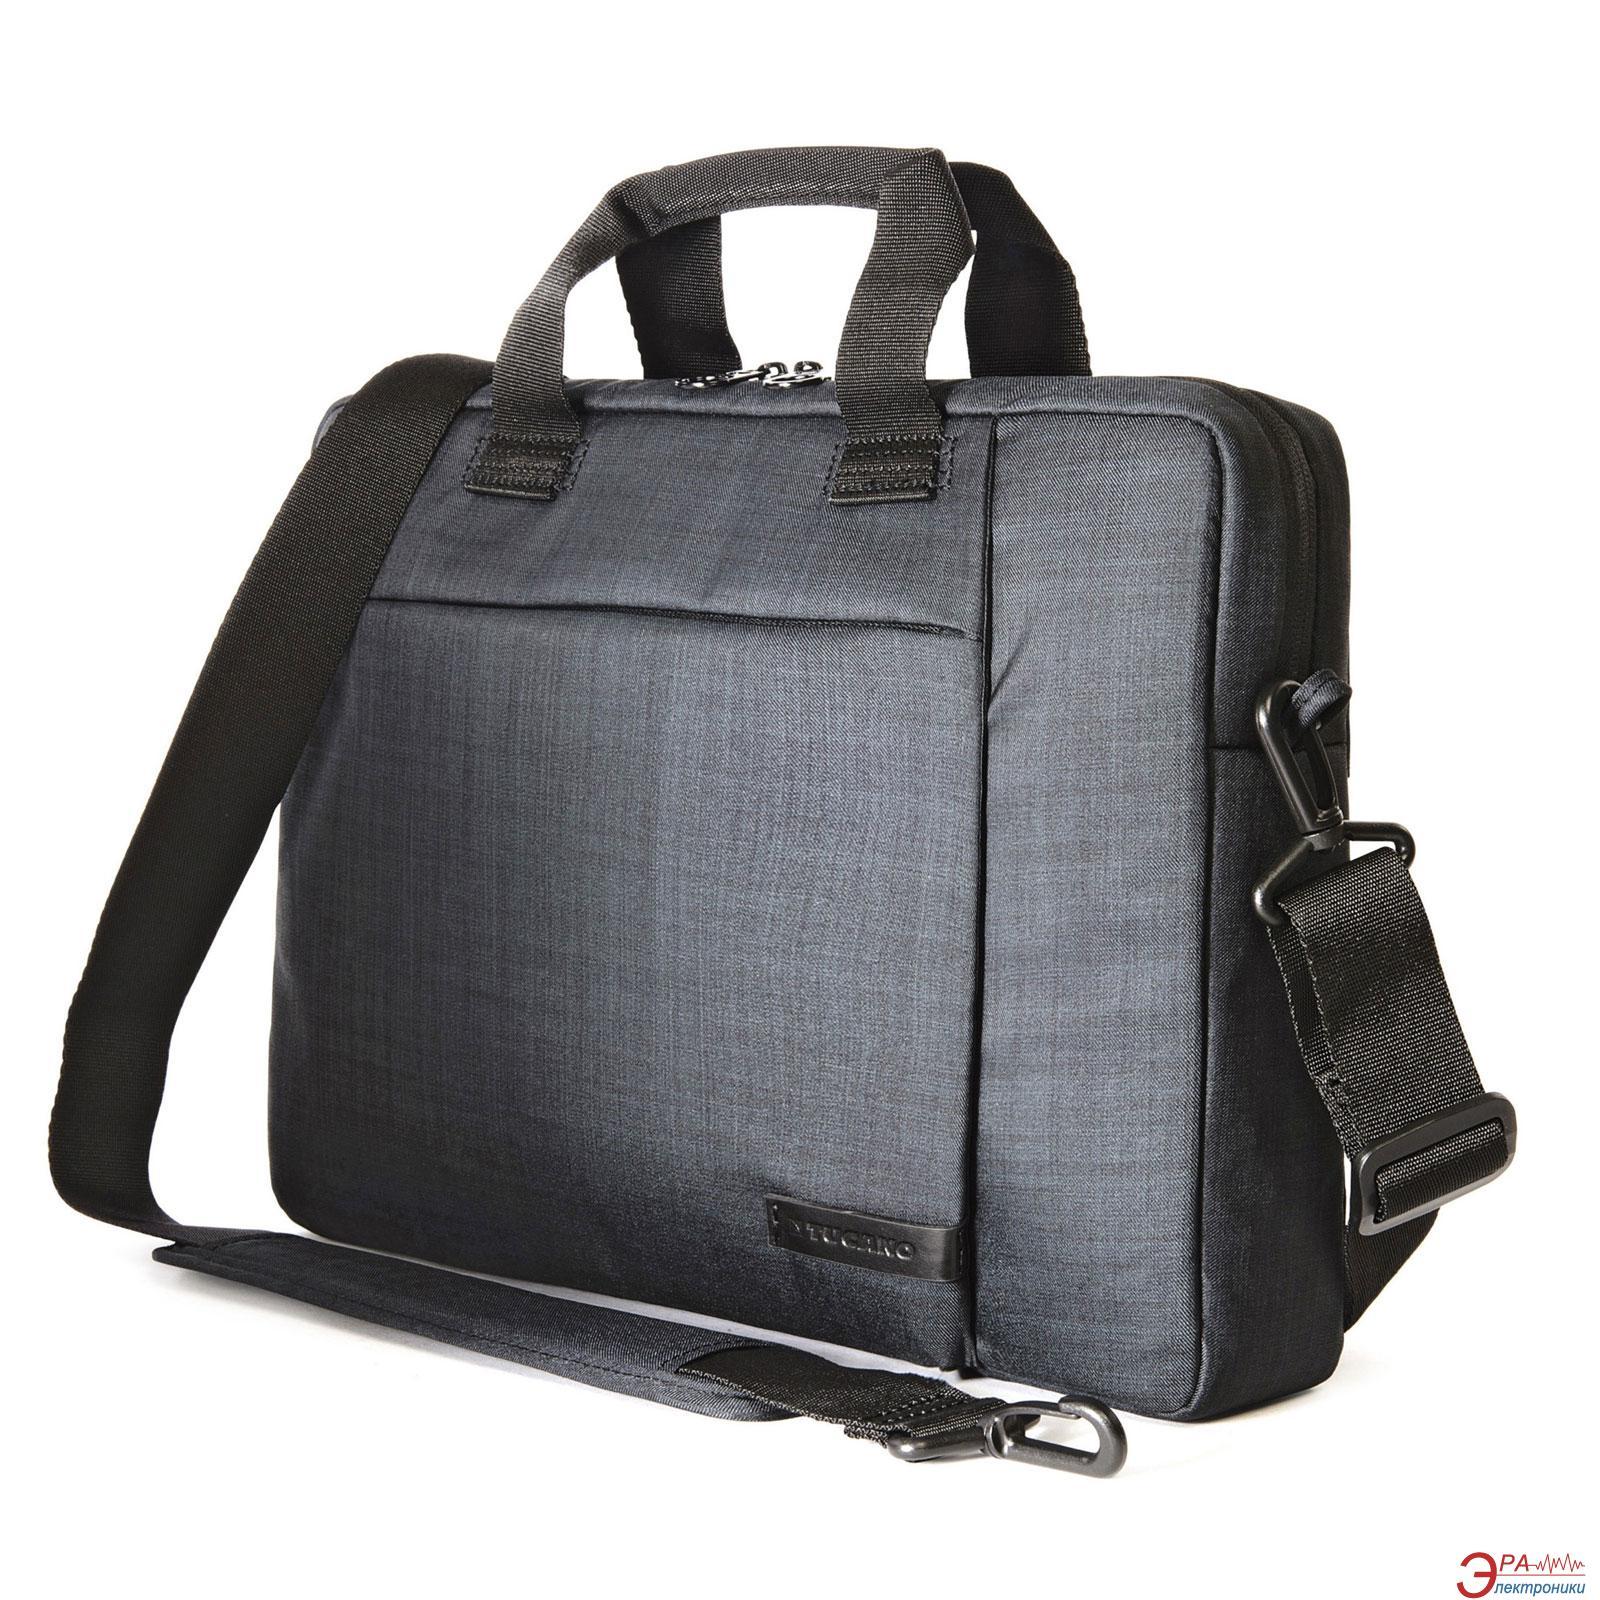 Сумка для ноутбука Tucano SVOLTA SLIM BAG PC 11.6/12.5 BLACK (BSVO1112)